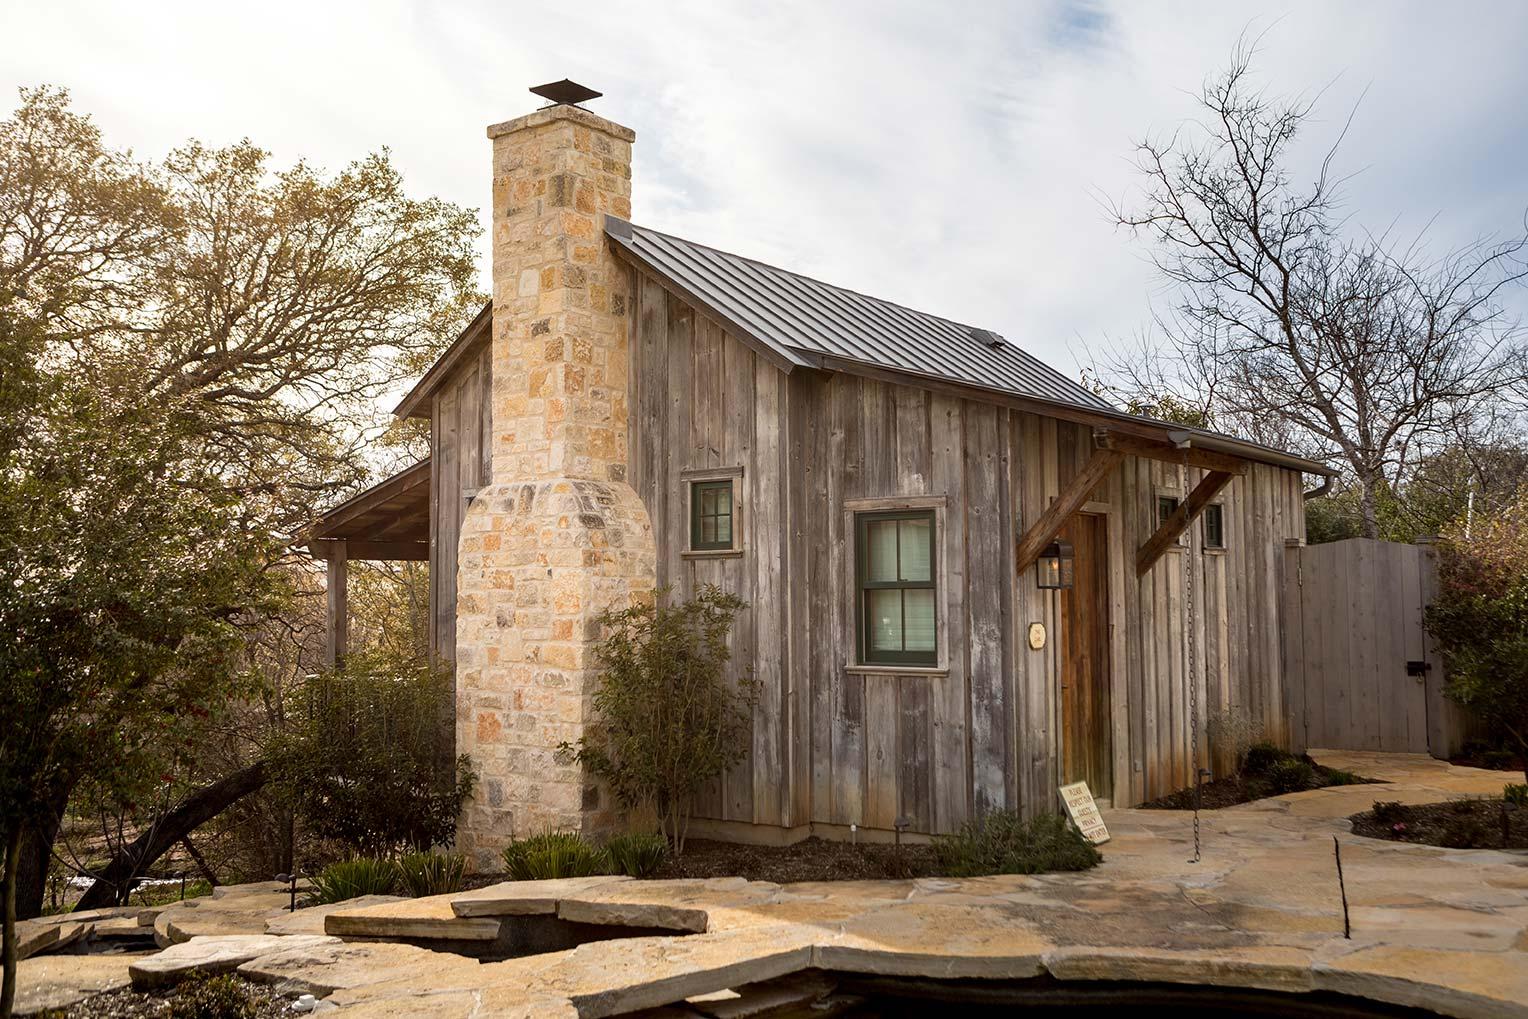 blacksmith-quarters-fredericksburg-realty-bnb-texas-commercial-realestate.jpg